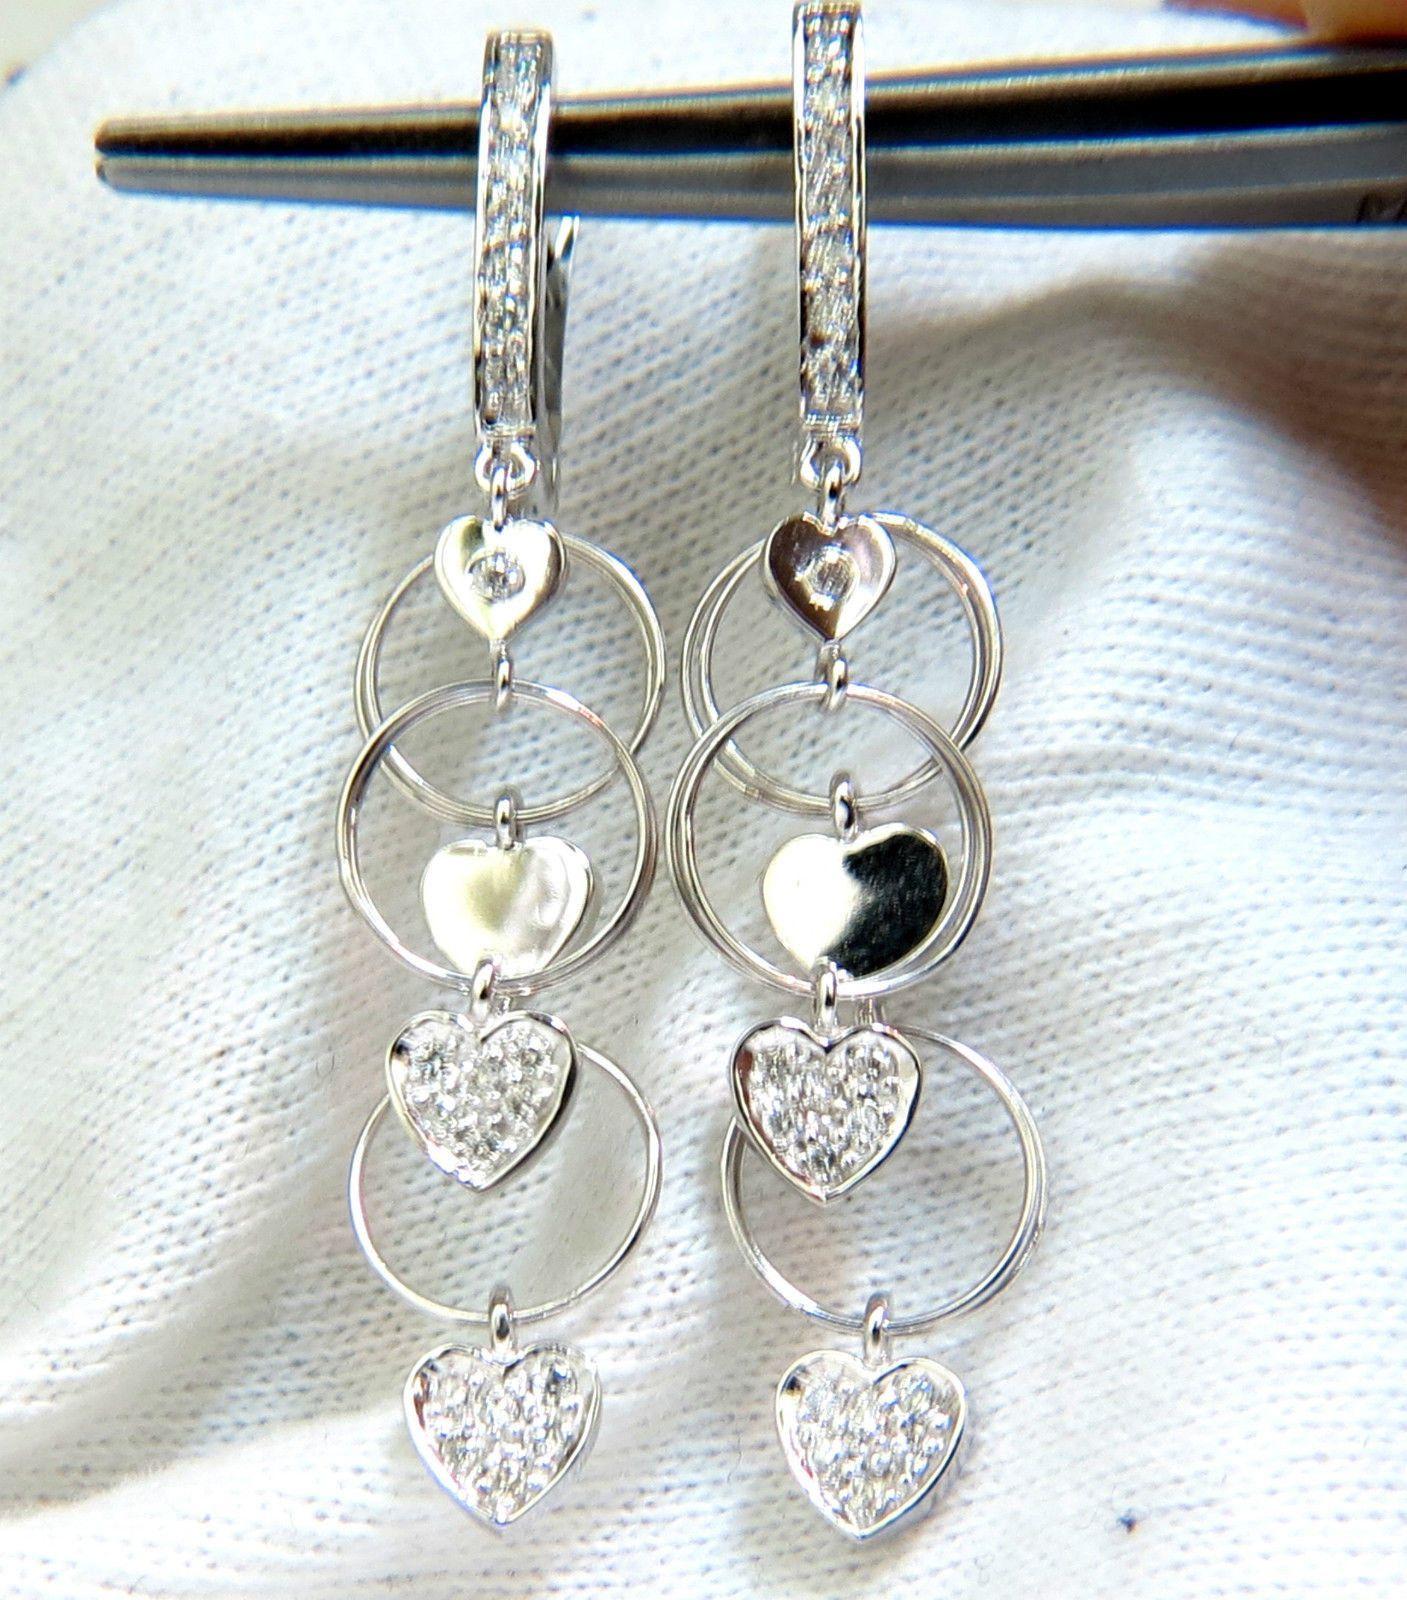 .70CT HEARTS & RINGS DIAMONDS DANGLE EARRINGS 14KT G/VS